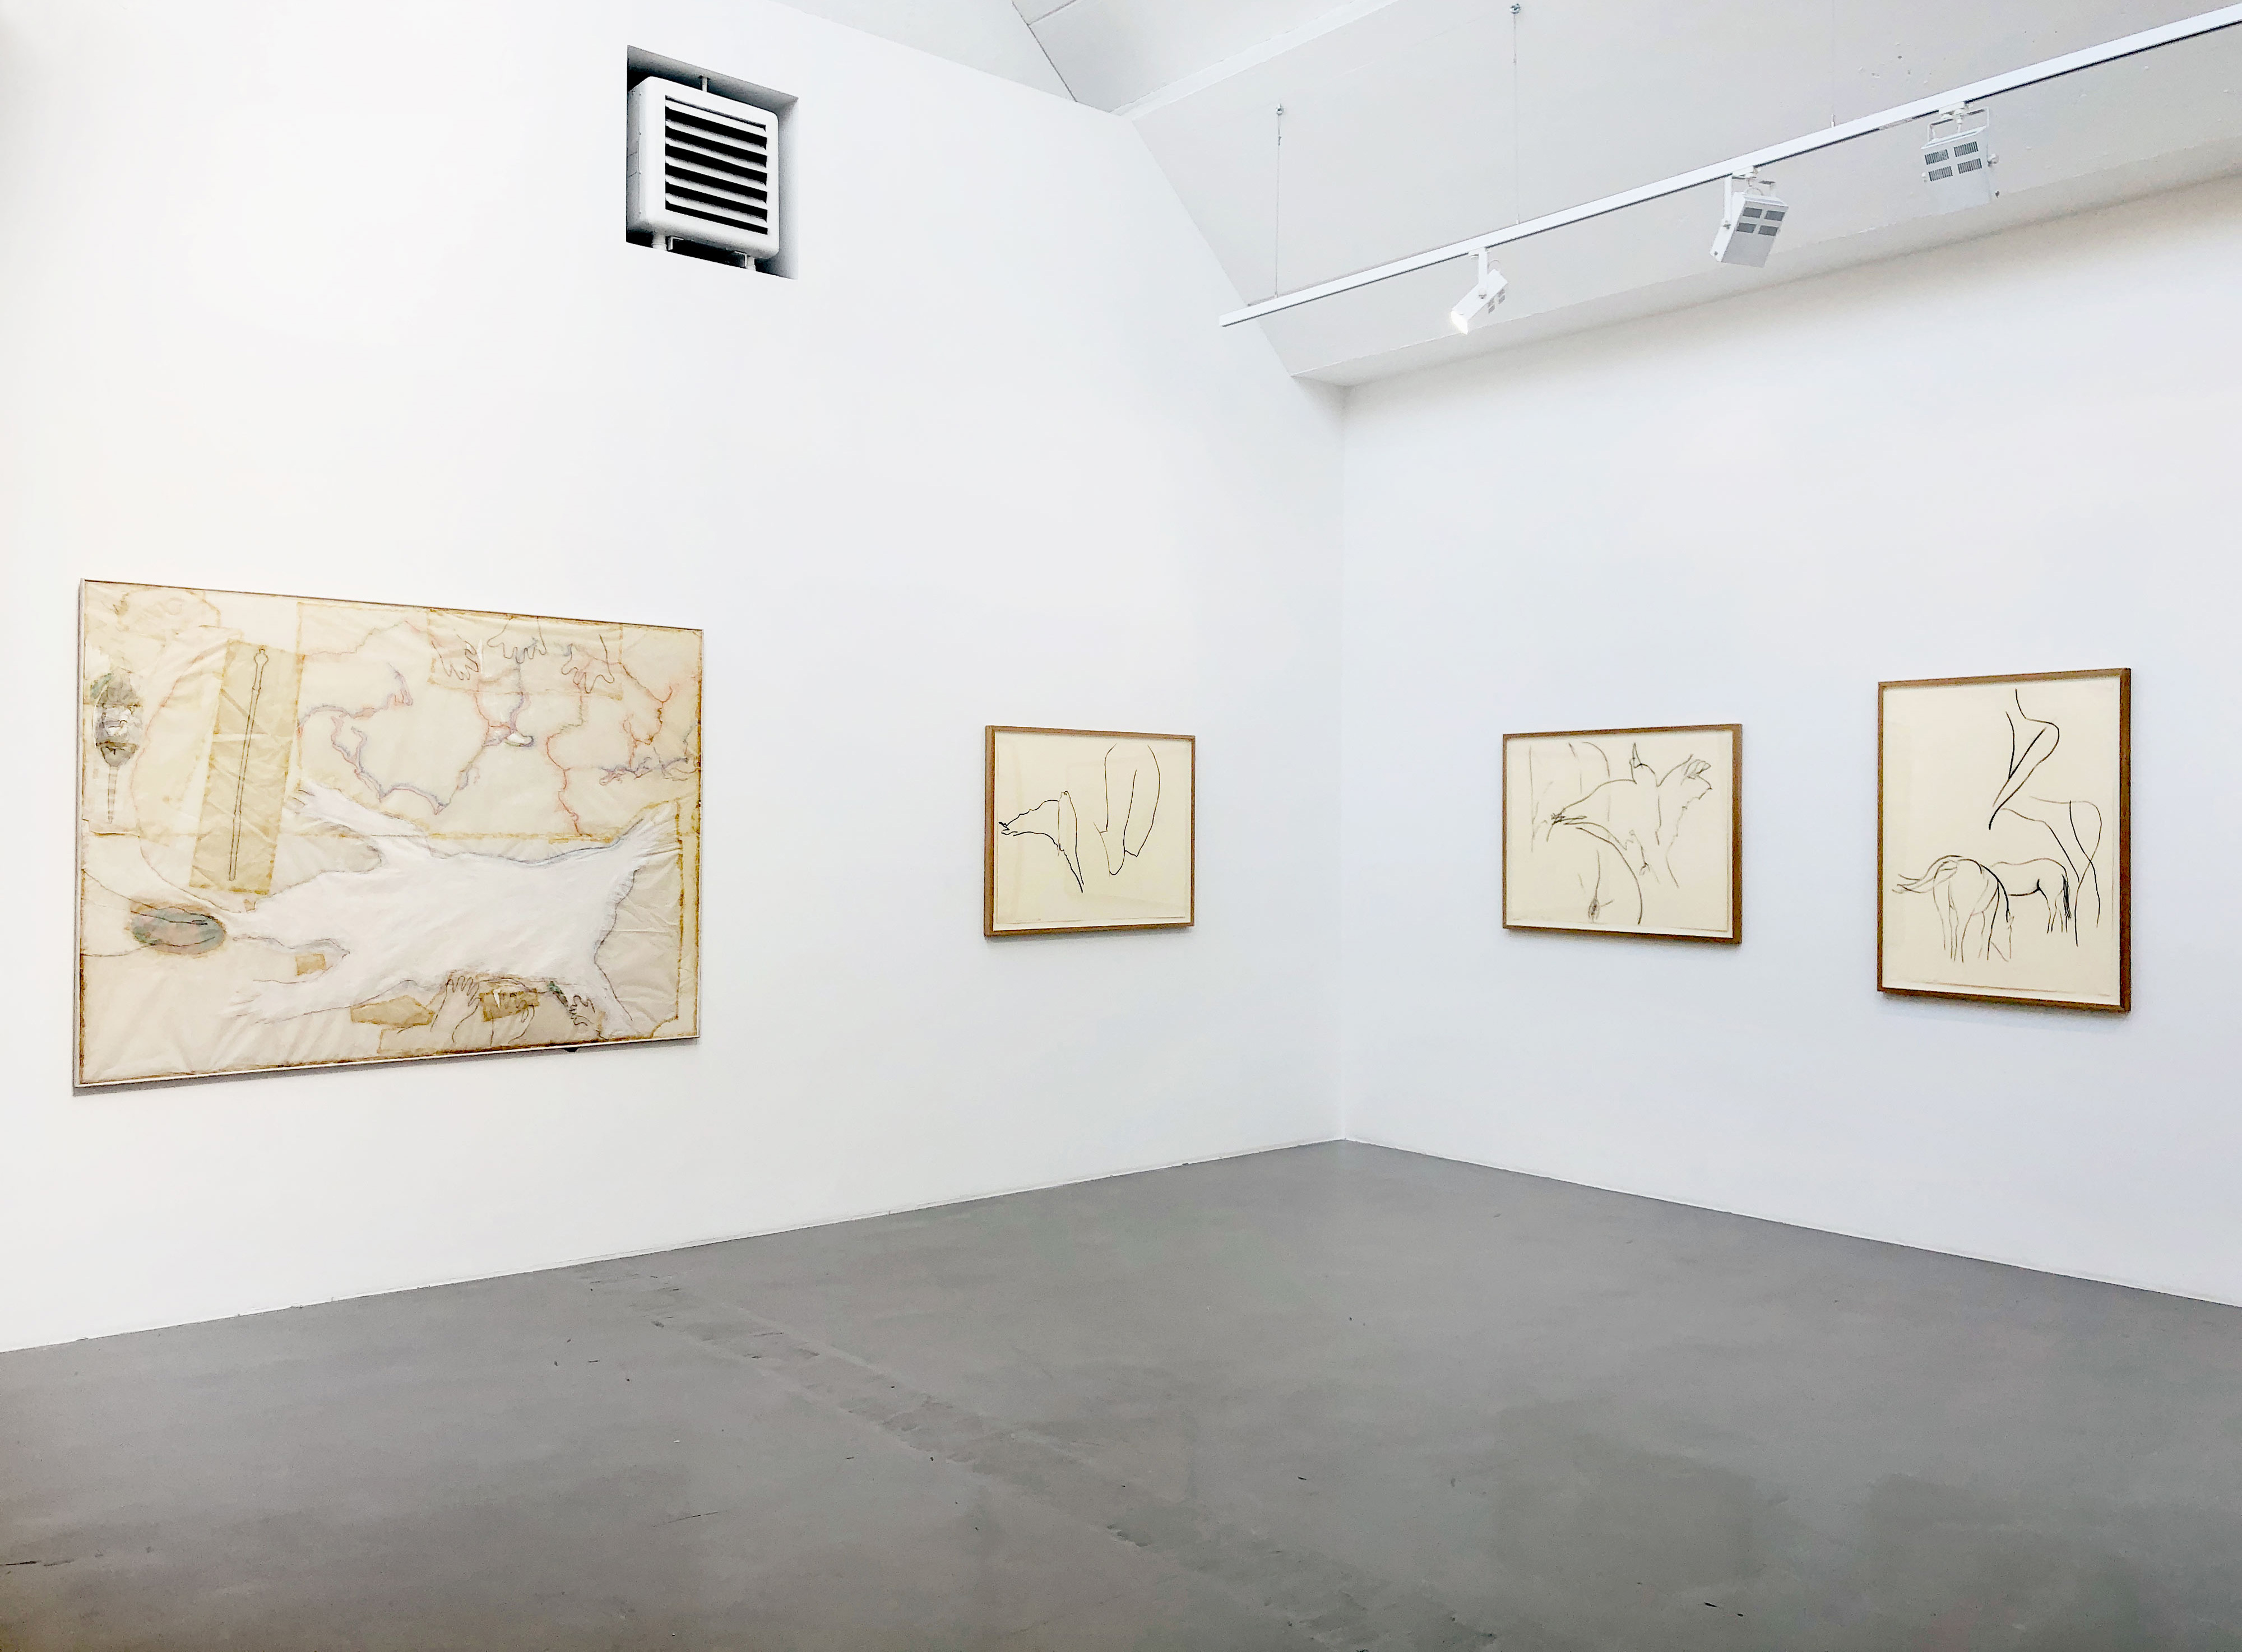 Galerie Barbara Thumm \ Jo Baer – Works on paper 1962–2018